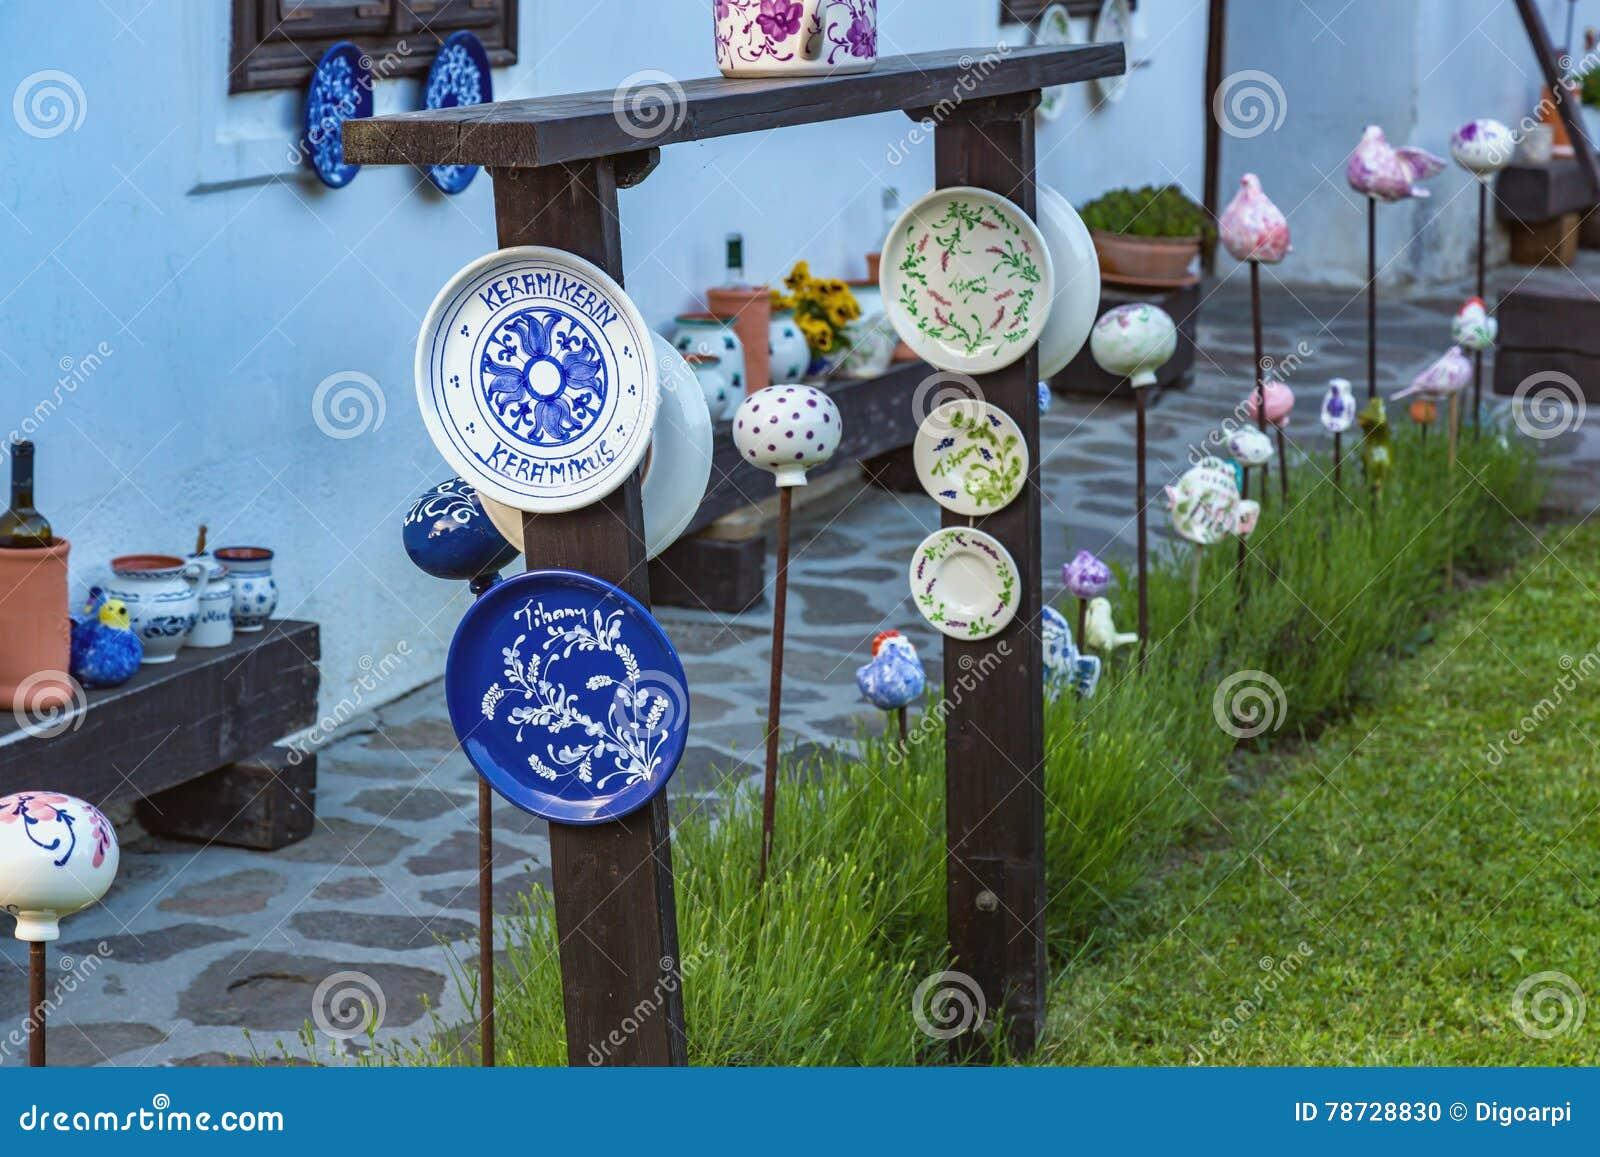 Ungersk handgjord keramik i byn Tihany